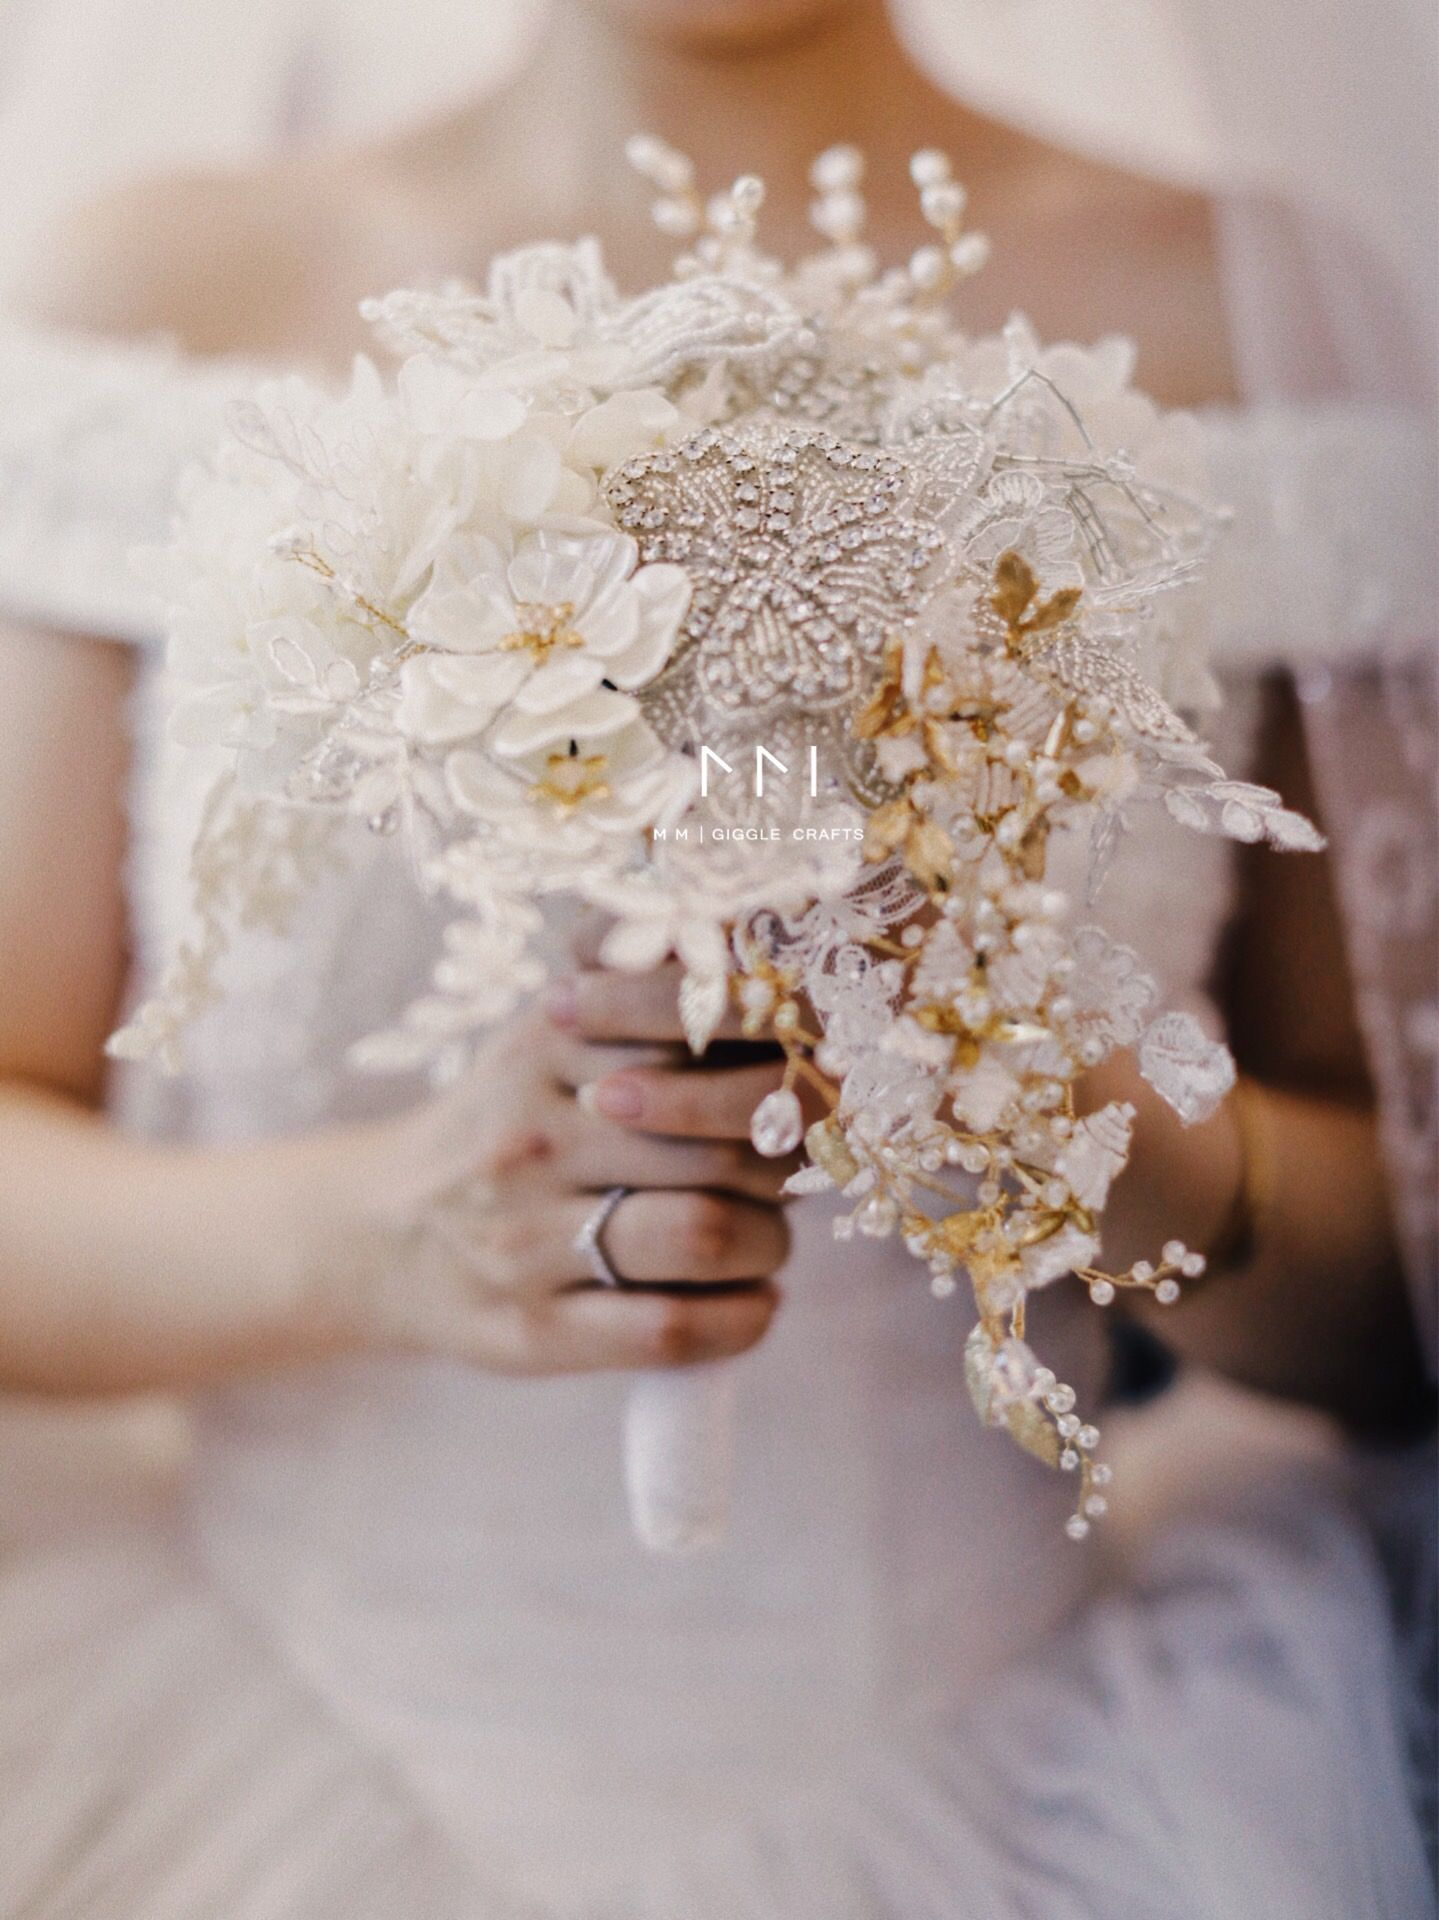 Handmade Jewelry Bouquet For Bride Wedding Bouquet Bridal Bouquet